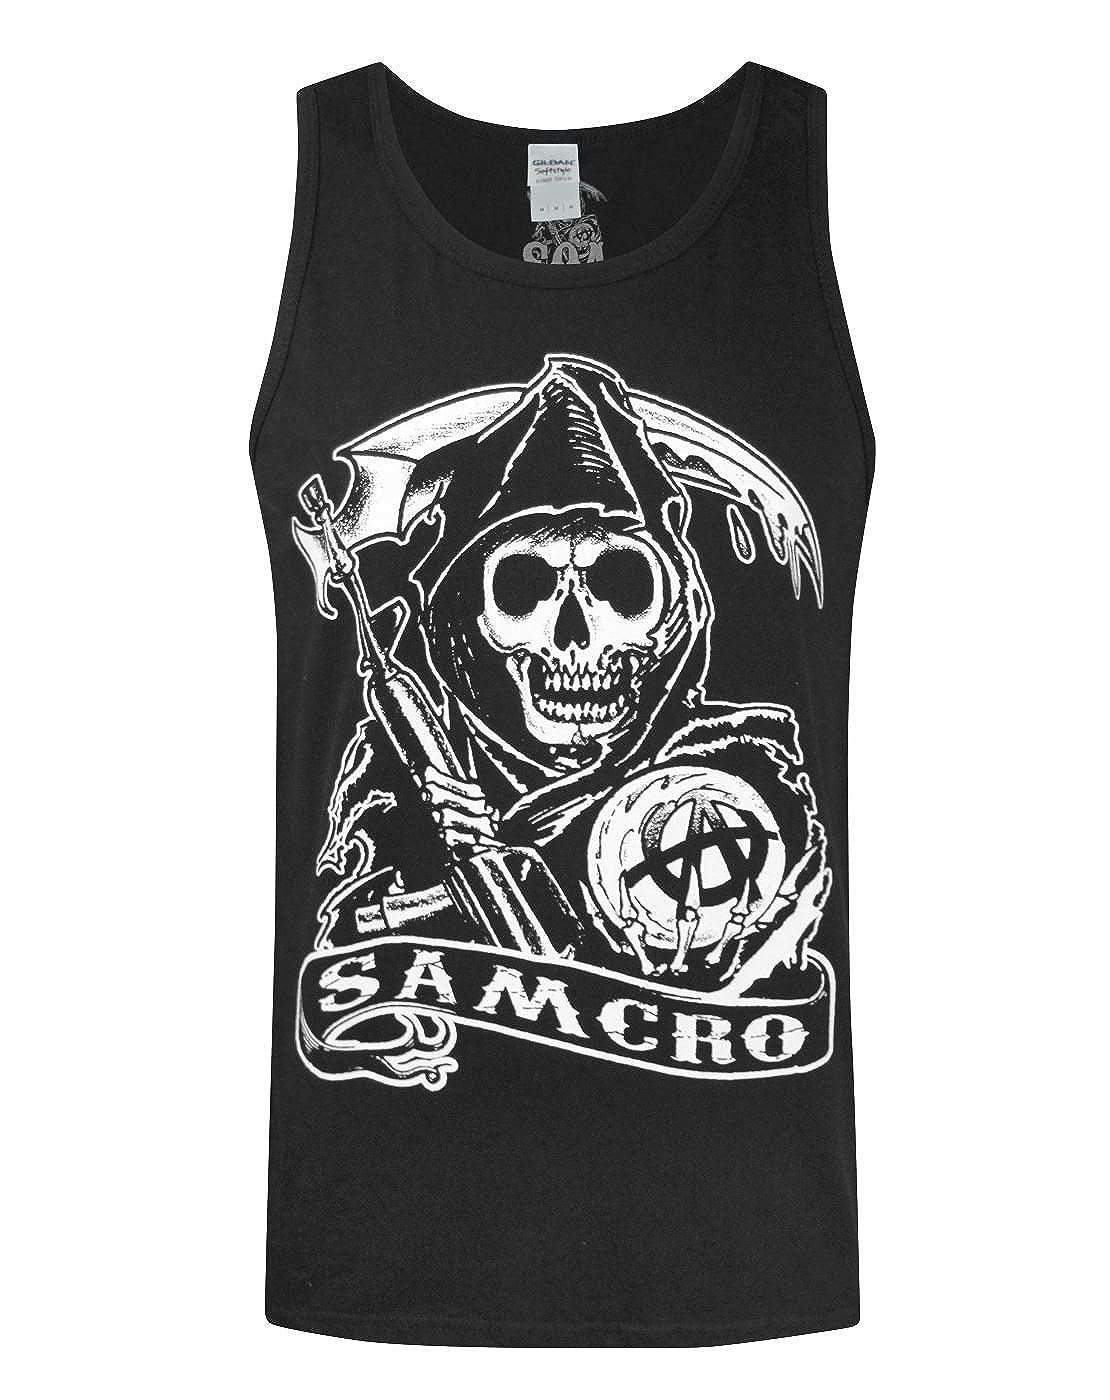 Official Sons Of Anarchy Samcro Men's Vest